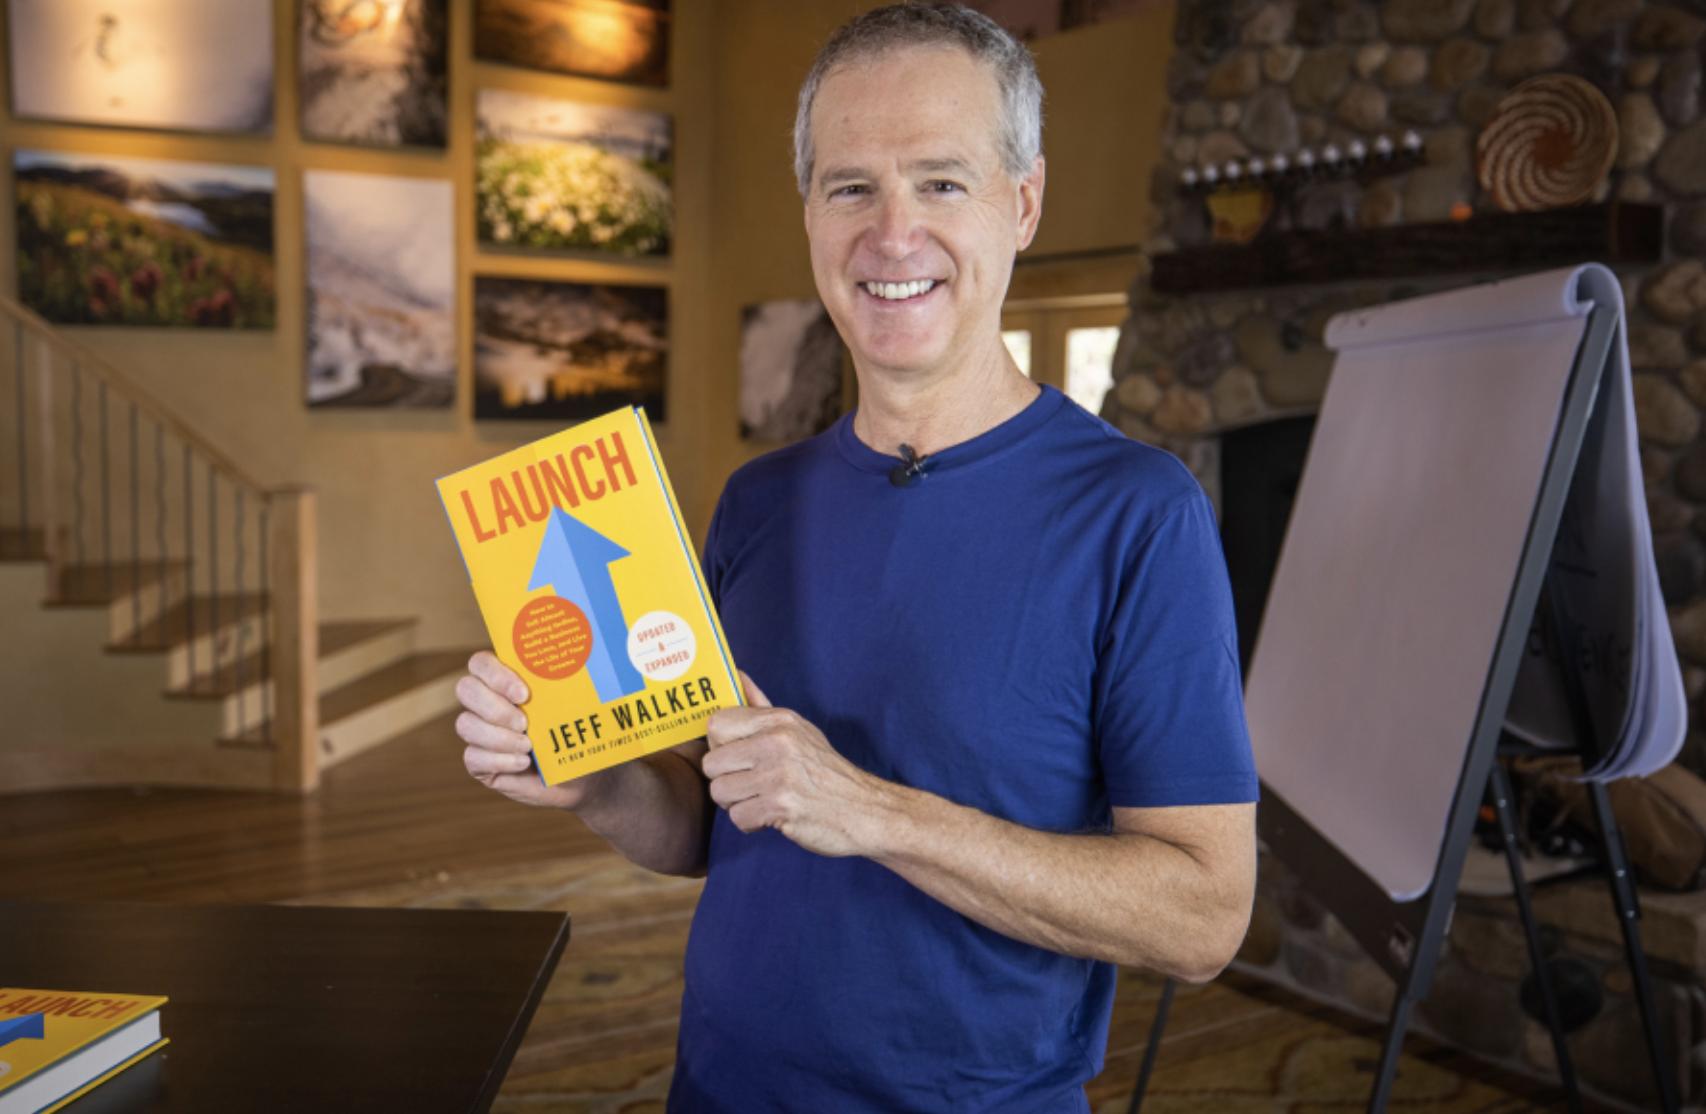 Jeff Walker Product Launch Formula Best Selling Book